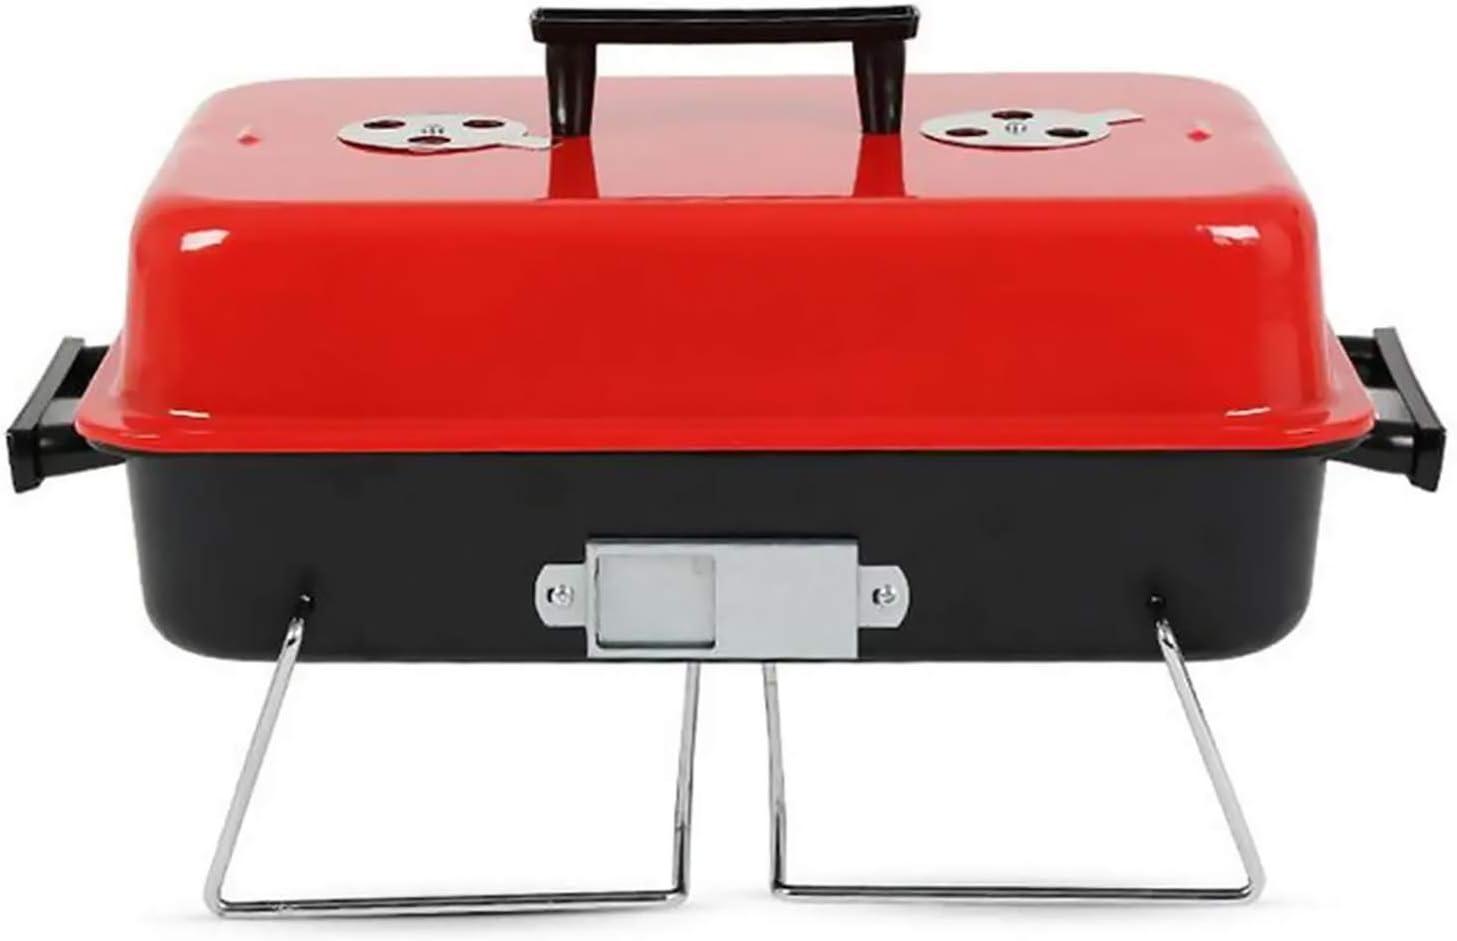 furein Barbacoa Portatil BBQ Clasica, Parrillera Portable, Grill Small Rack, Estufa de Cocina Picnic, Acampada, Camping, Playa, Stainless Steel Charcoal Meat Cooking Machine